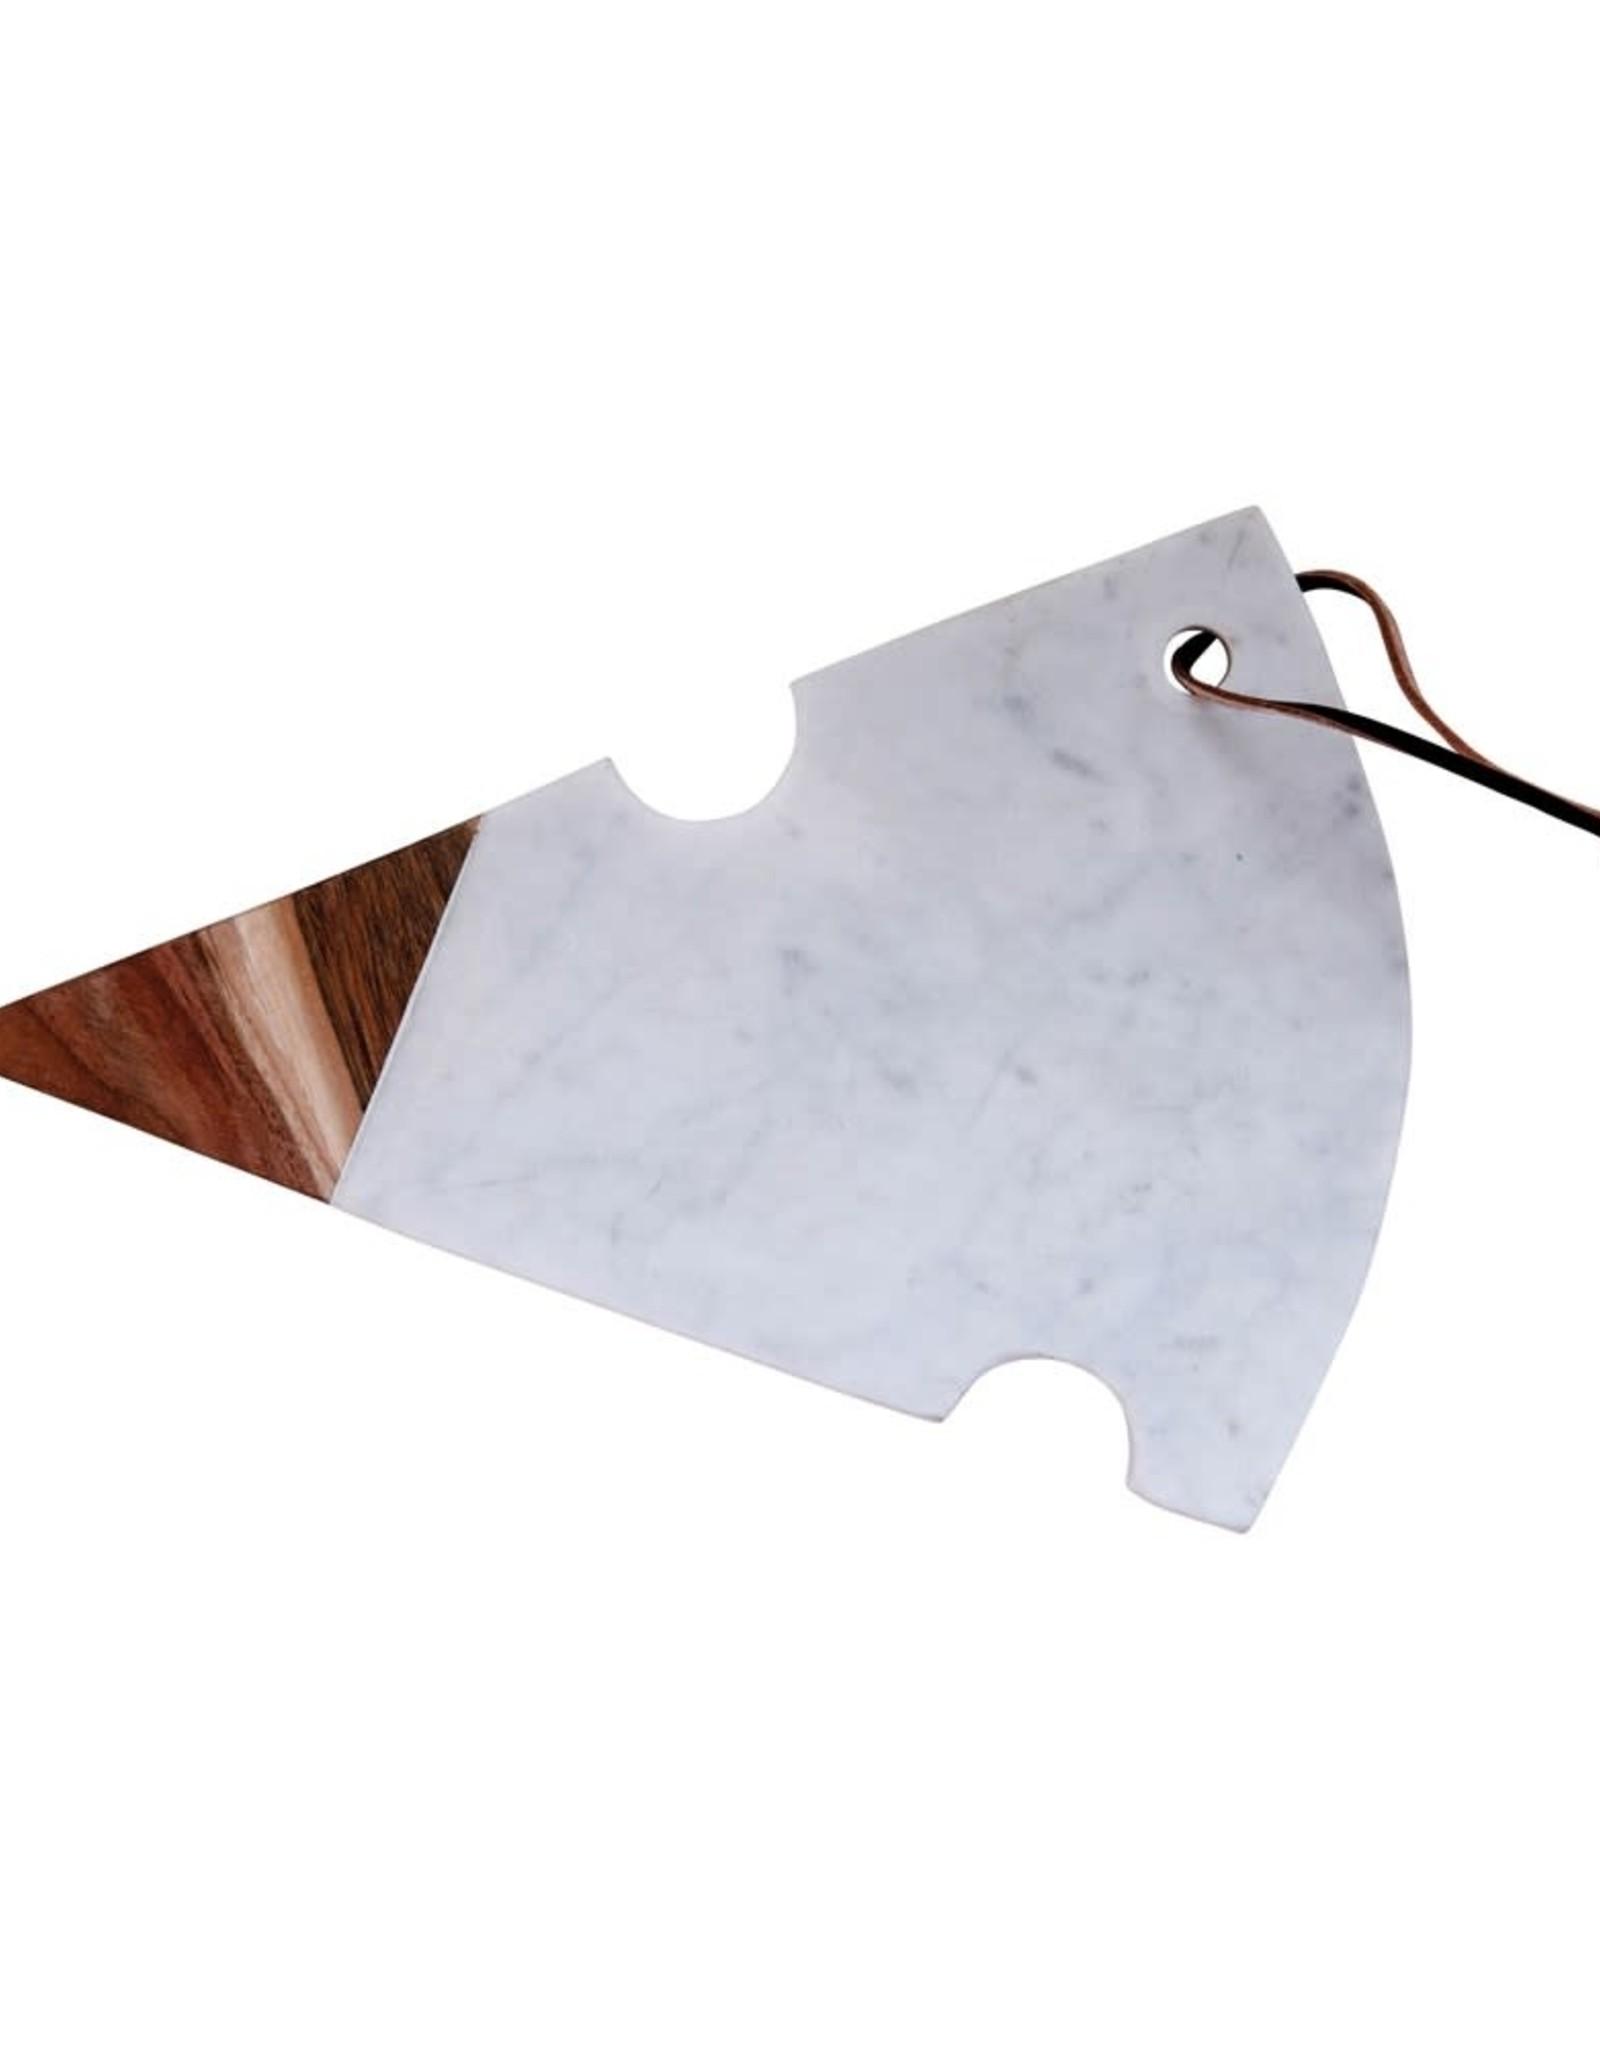 Wink Marble/Acacia Cheese Board